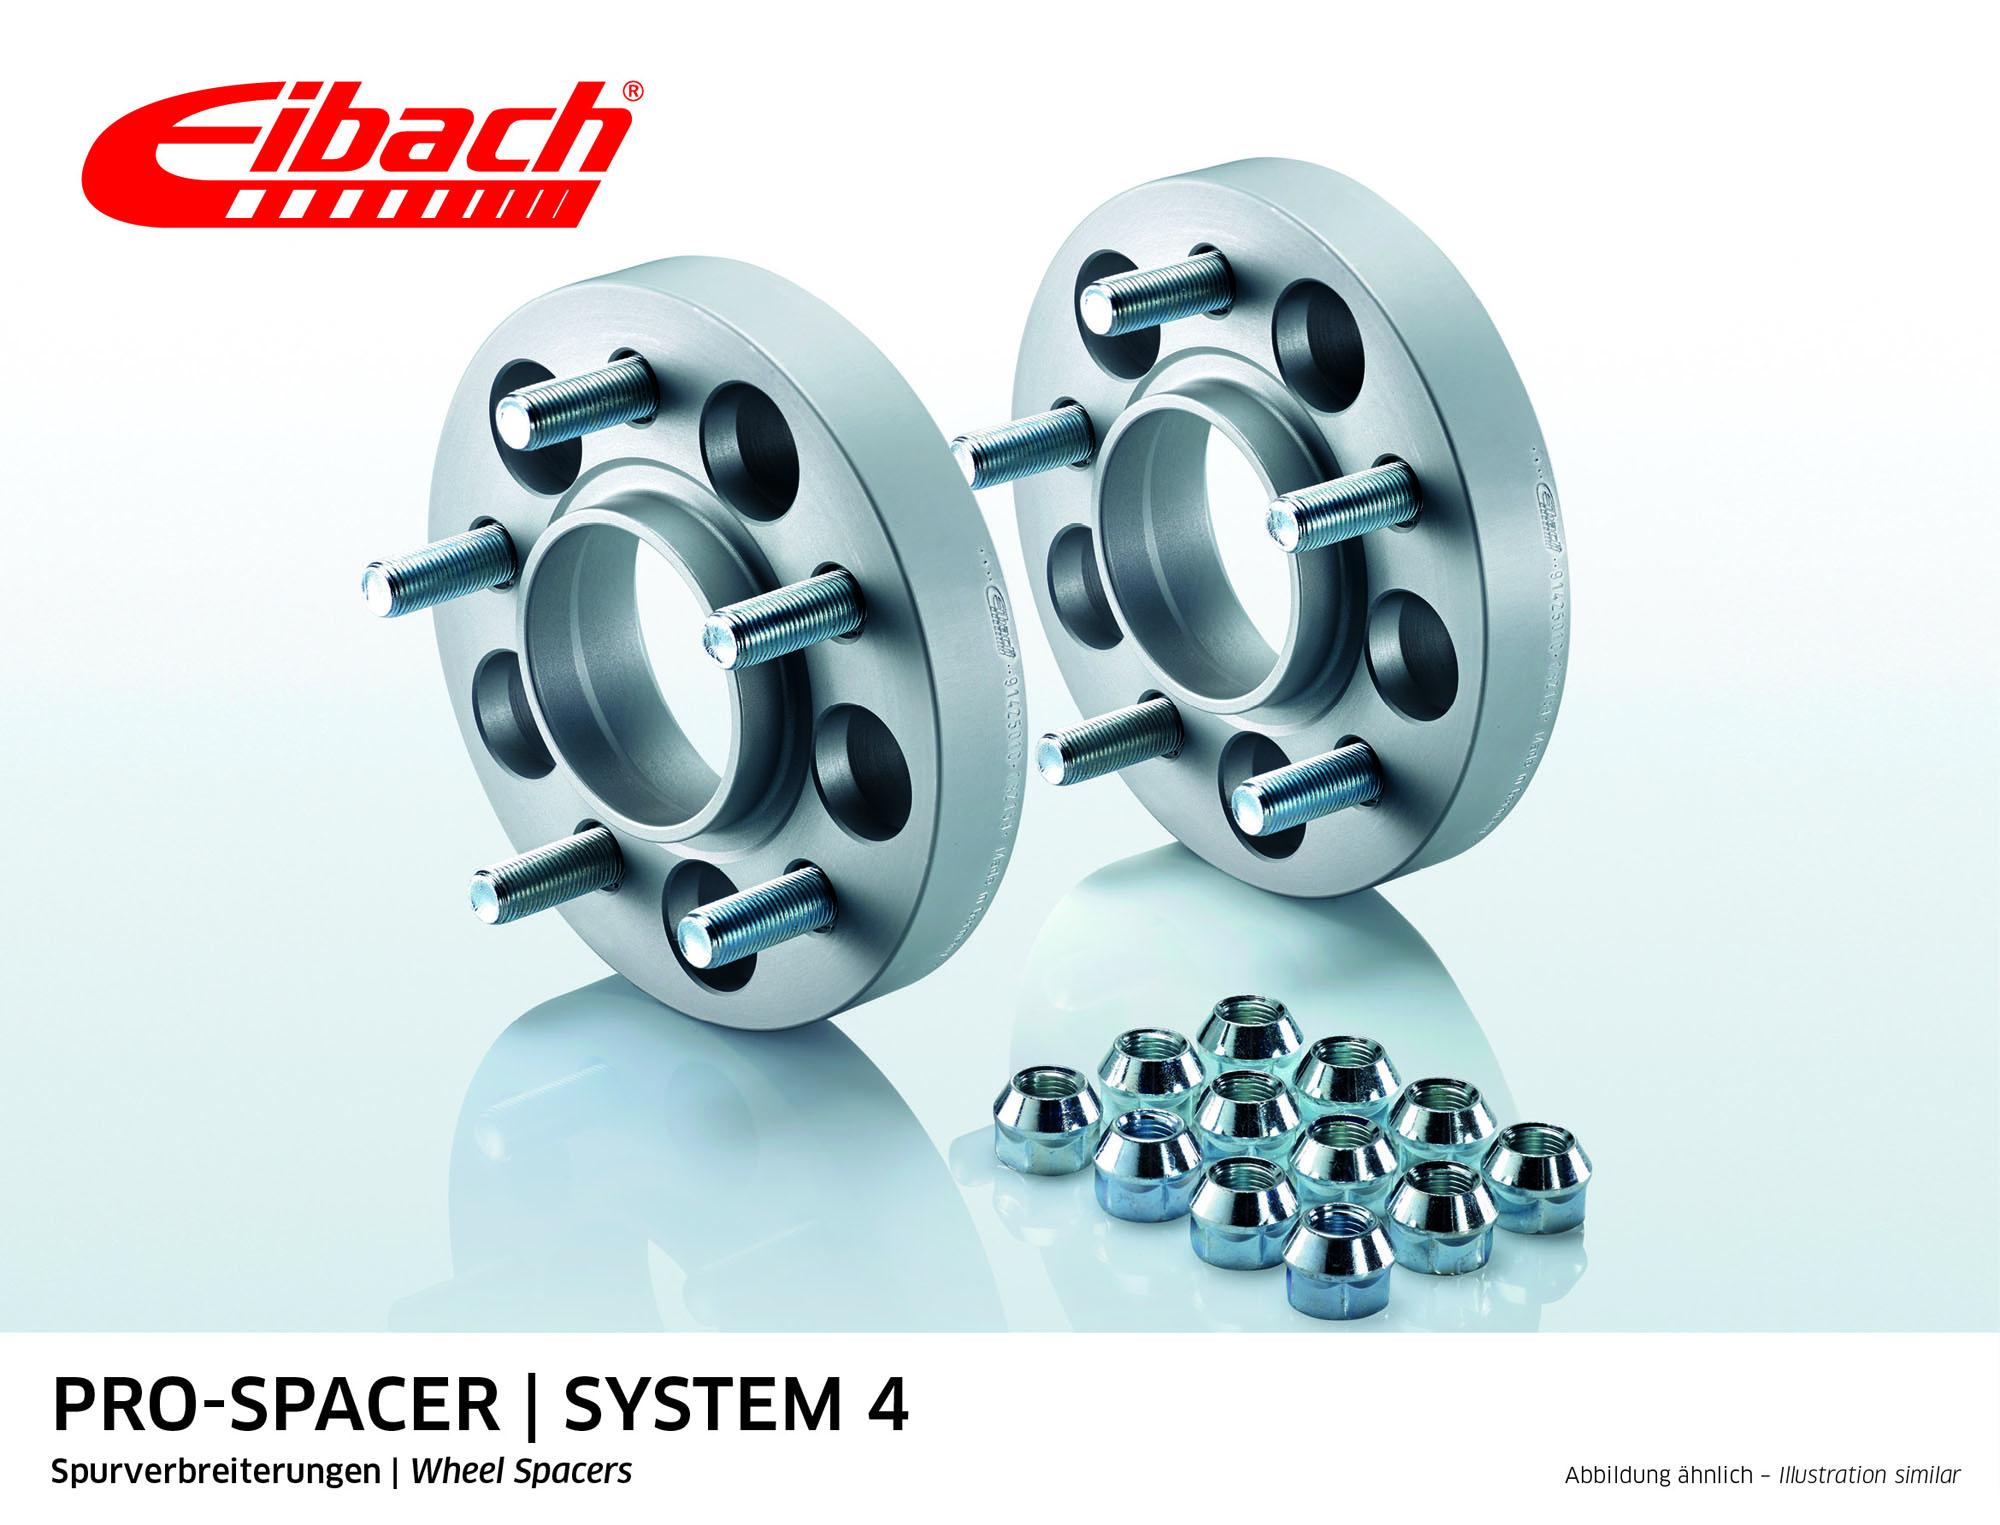 eibach pro spacer kit 15mm per spacer system 4 s90 4 15 002 eibach suspension eibachshop. Black Bedroom Furniture Sets. Home Design Ideas